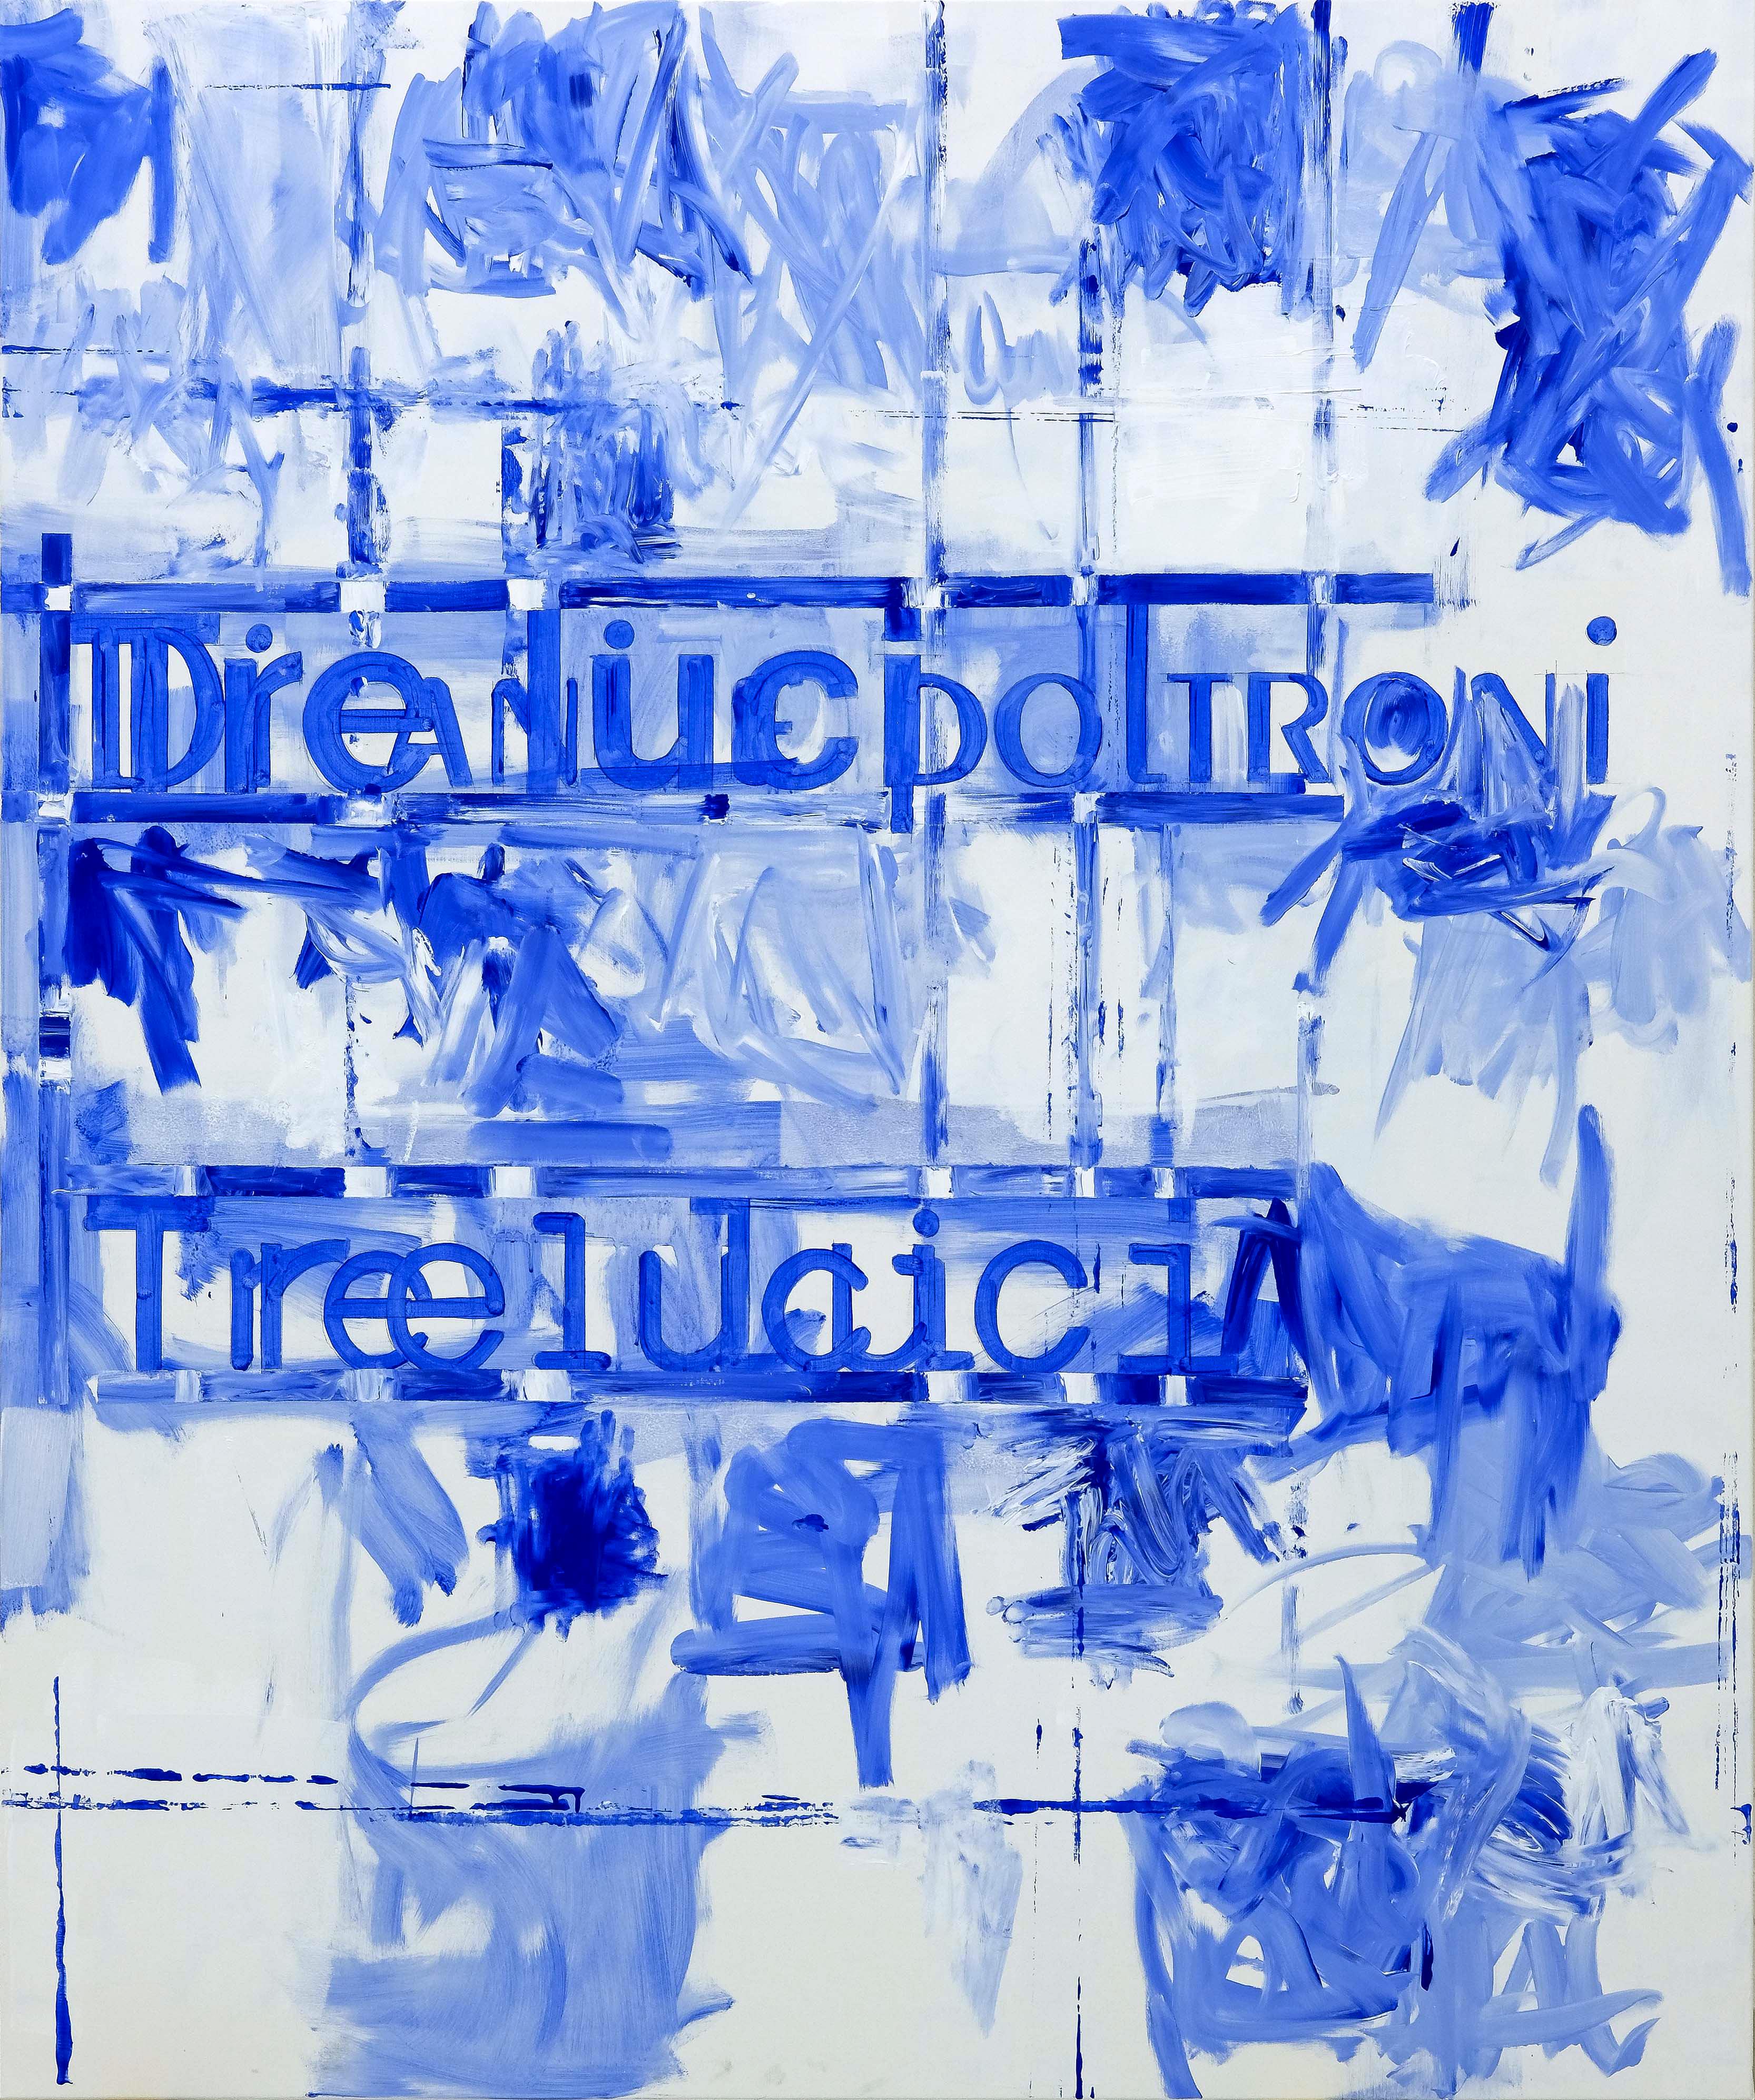 Untitled, 2016, acrylic on canvas, 180 x 150 cm